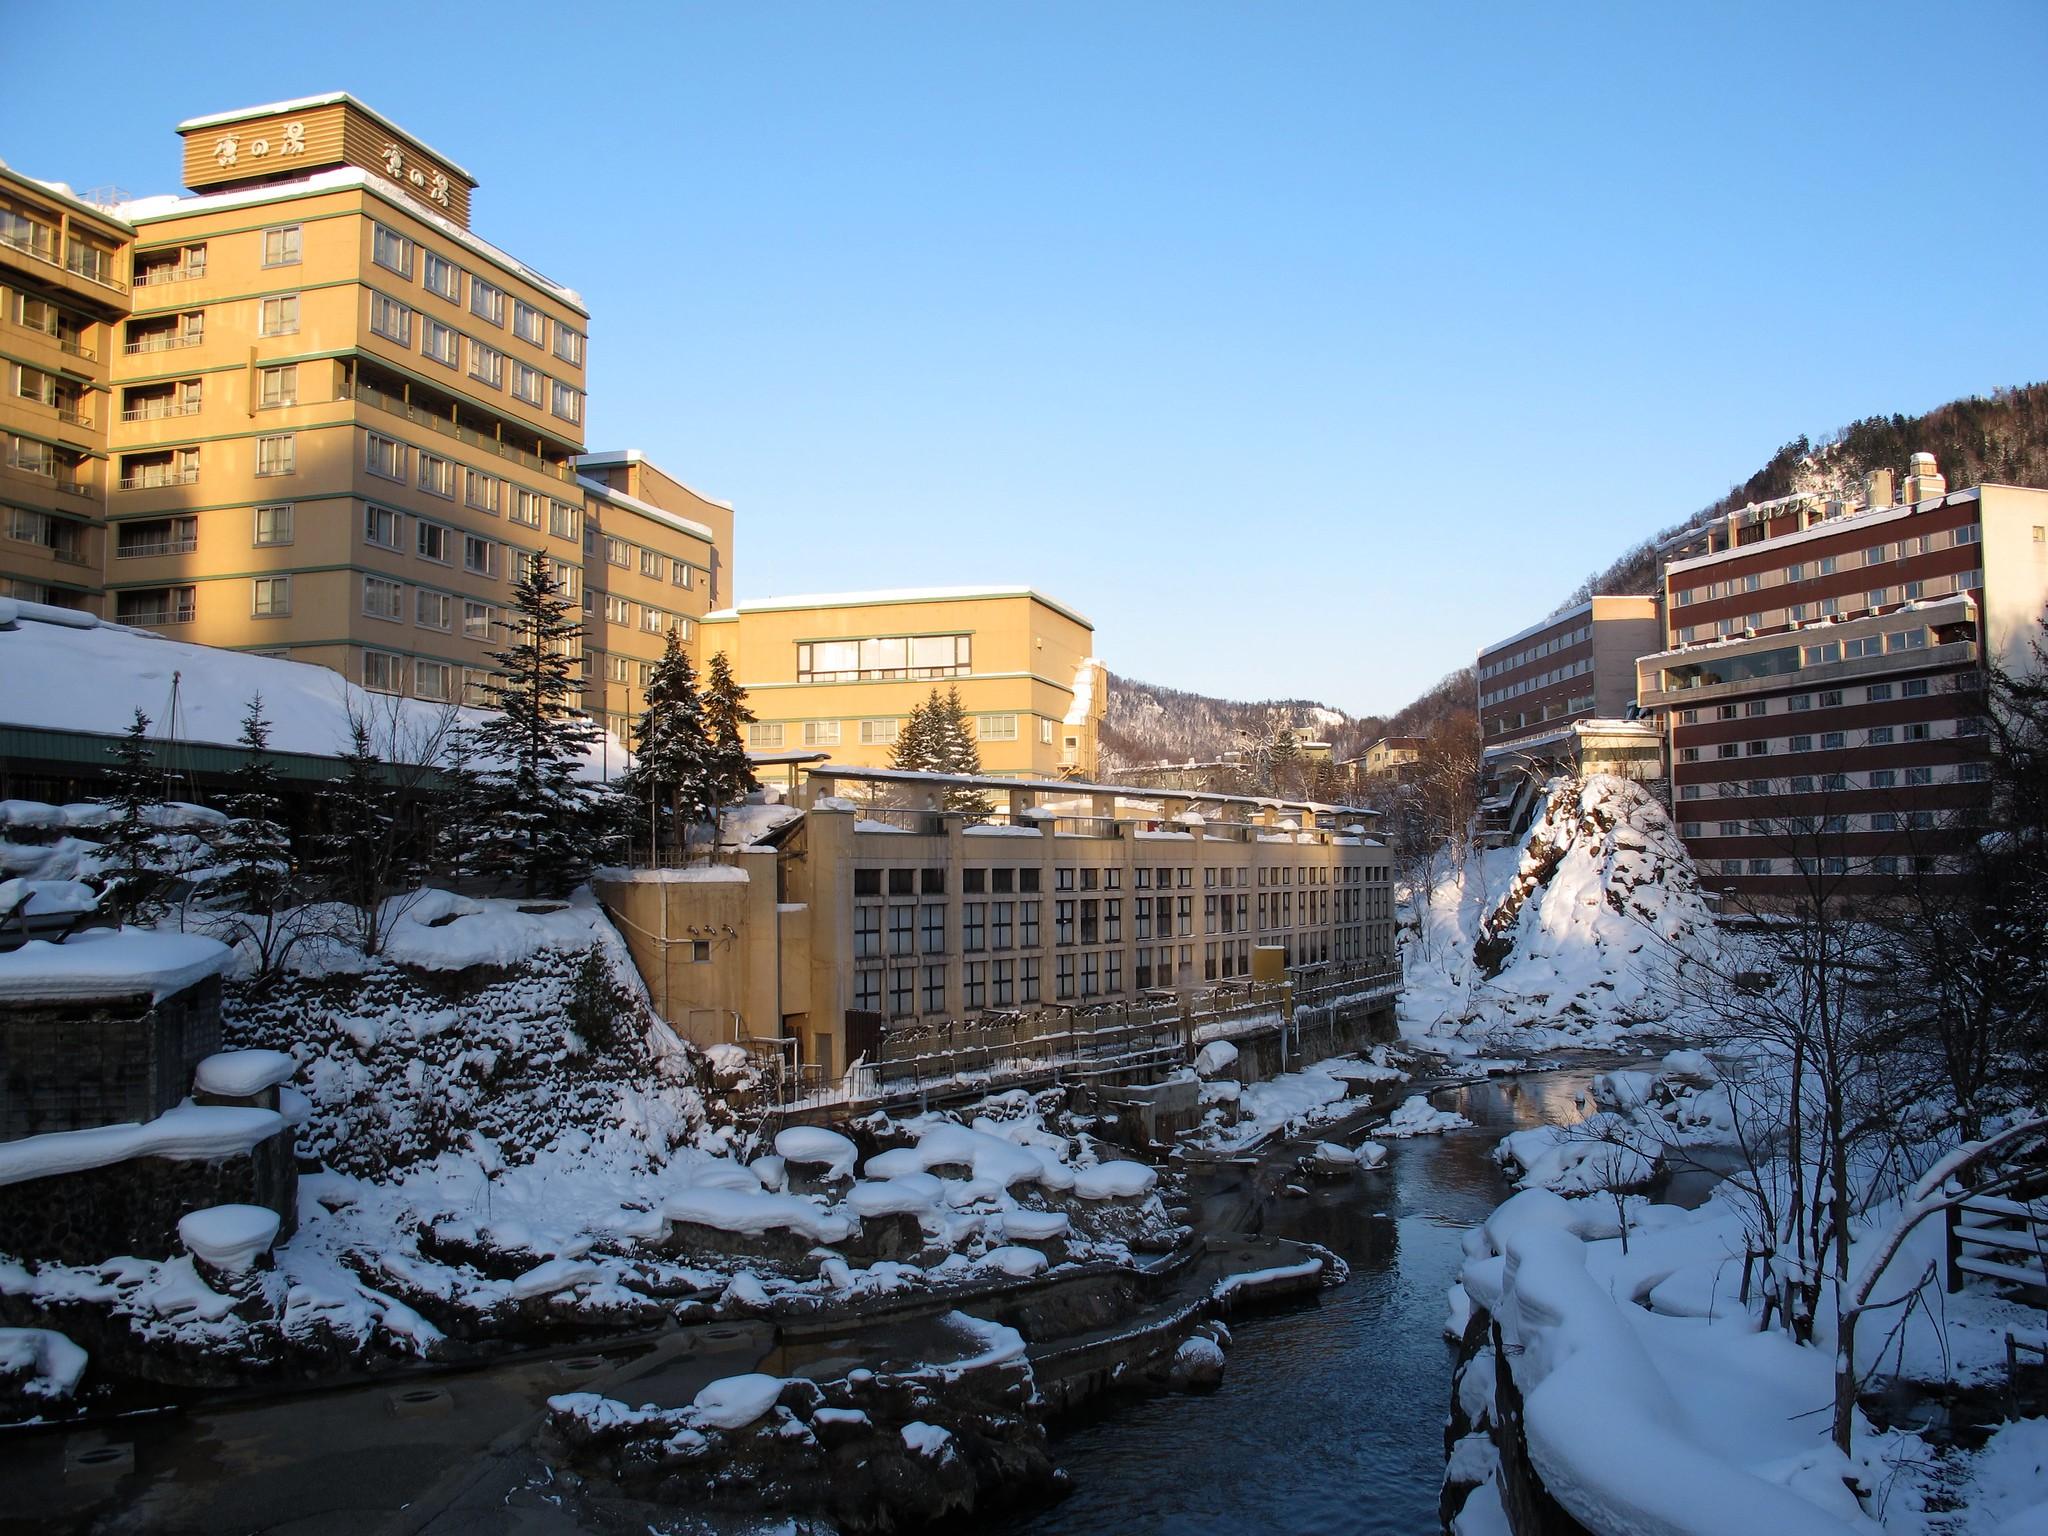 10 Things to do in Sapporo, Hokkaido, Japan 01